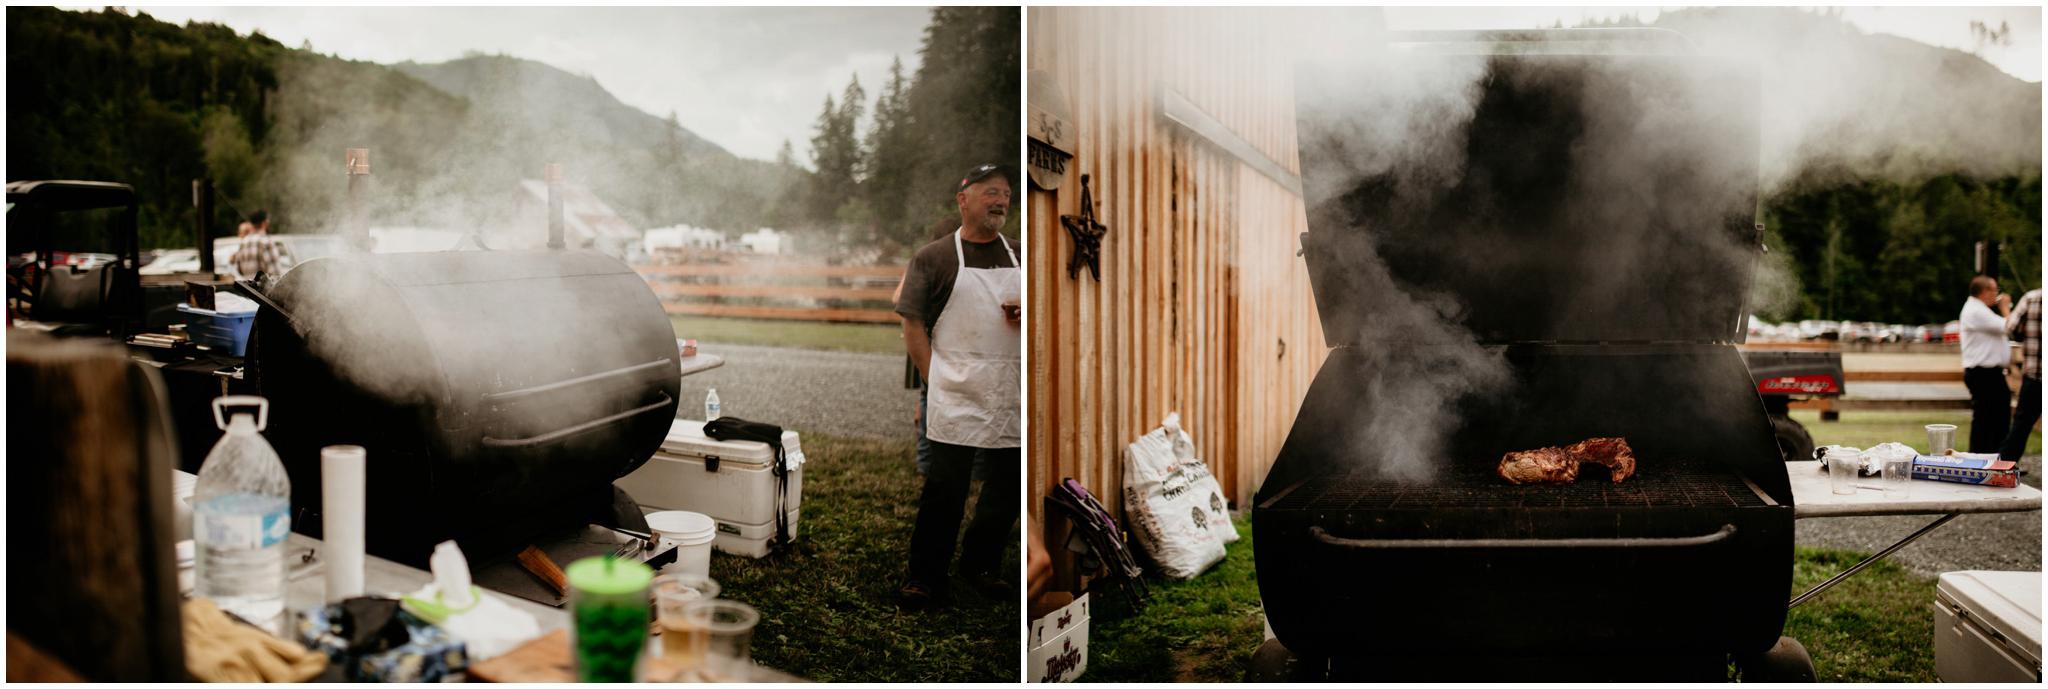 alex-and-matthew-three-cs-farm-venue-seattle-wedding-photographer-155.jpg